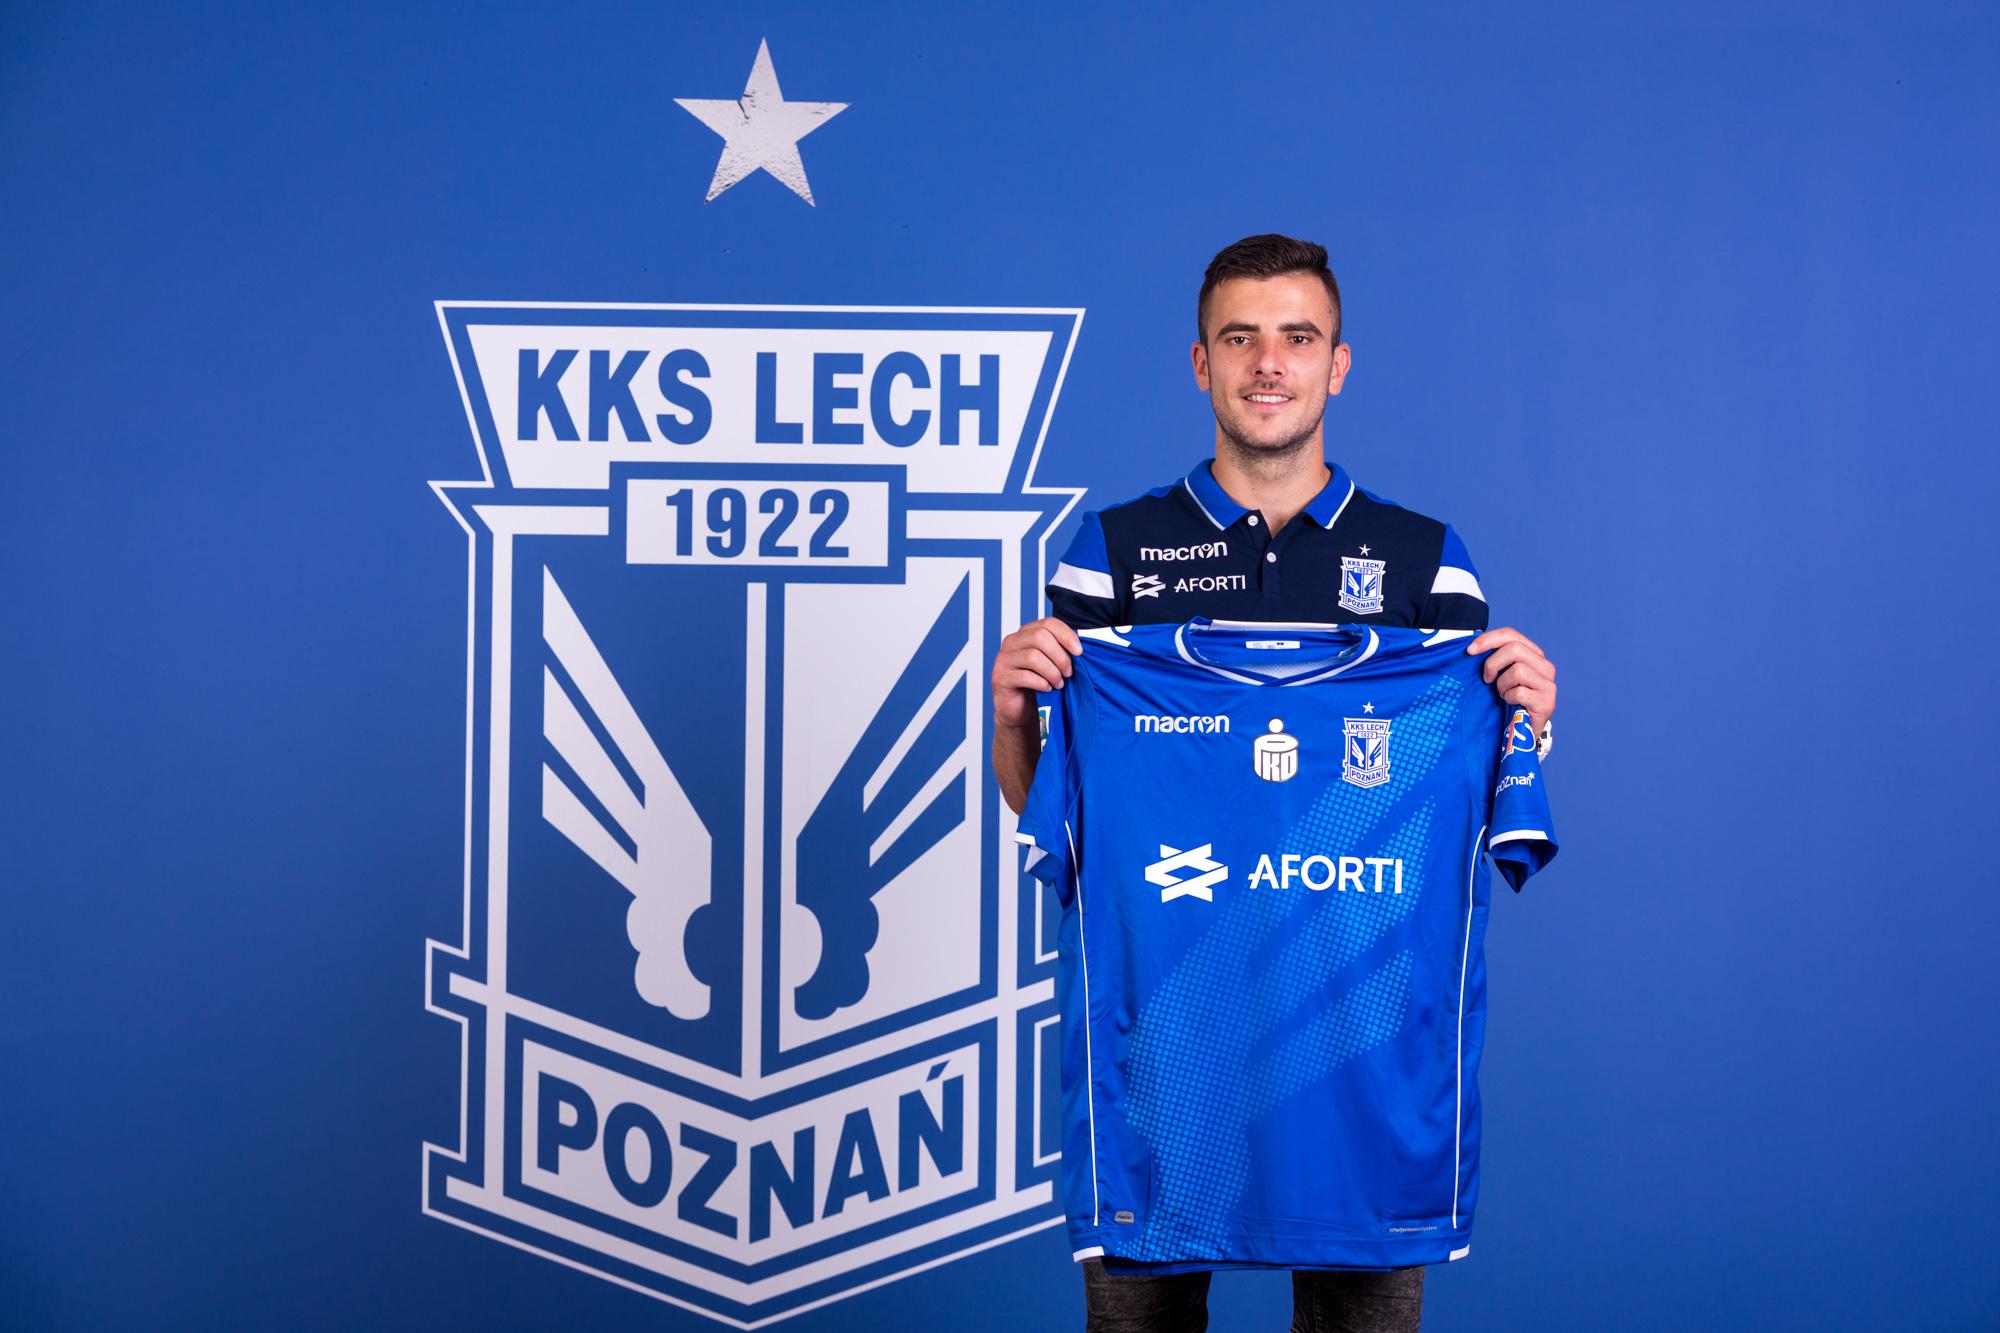 Djordje Crnomarković piłkarzem Lecha